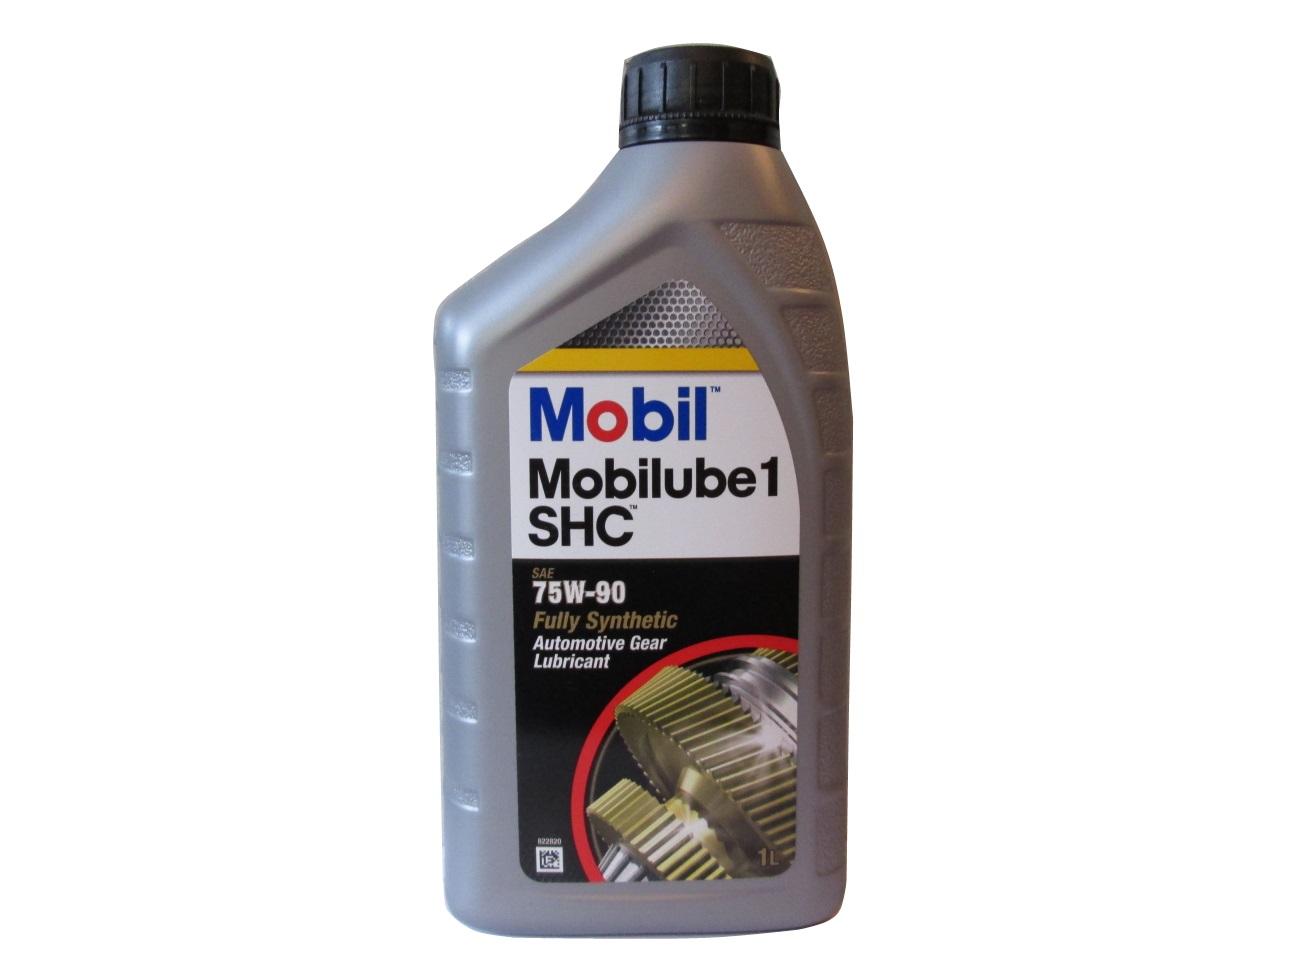 Mobilube 1 SHC 75W-90 (1 л)